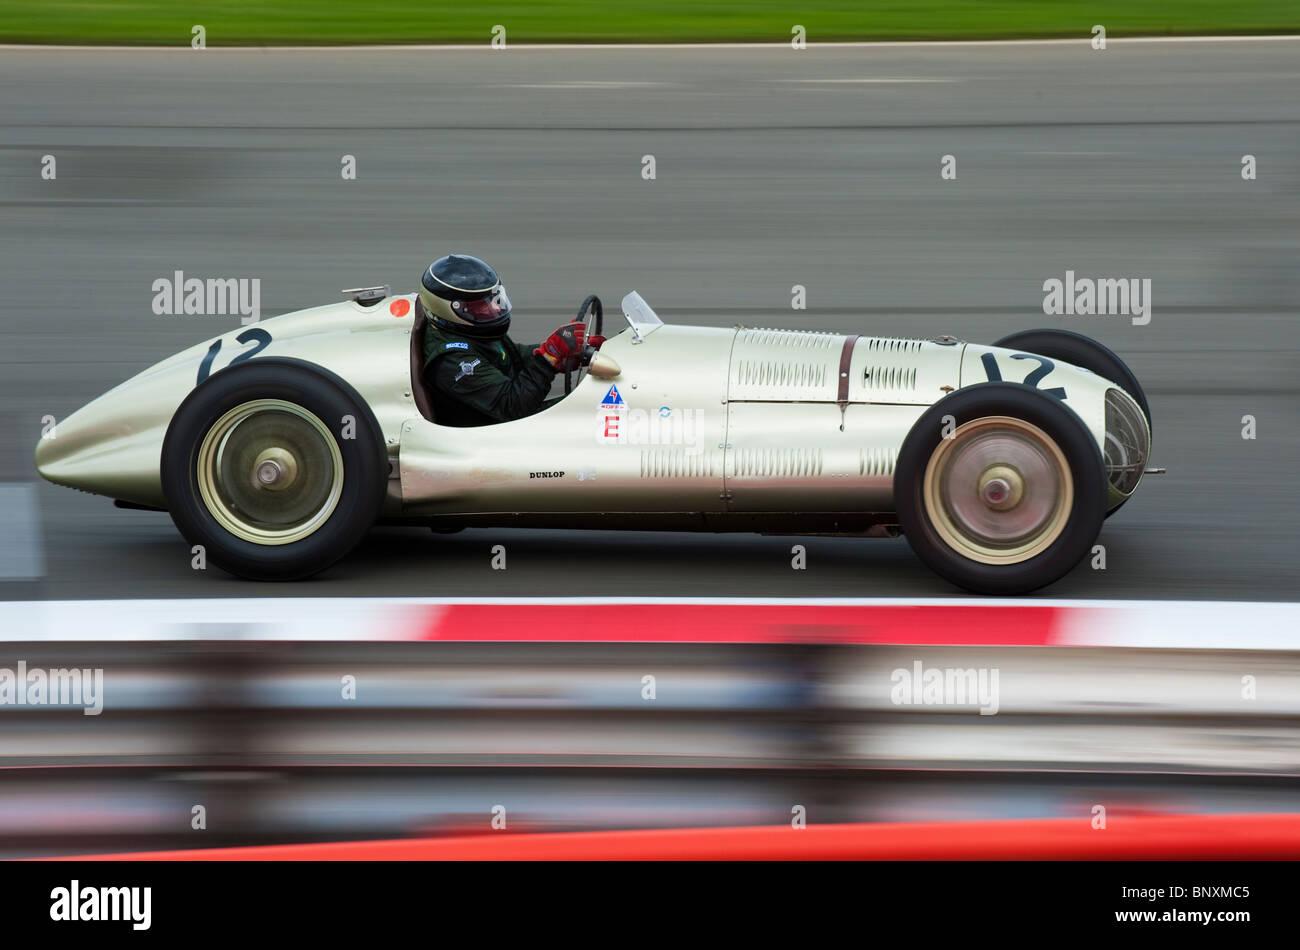 ERA GP1 Grand Prix racing car at 2010 Silverstone Classic, England - Stock Image